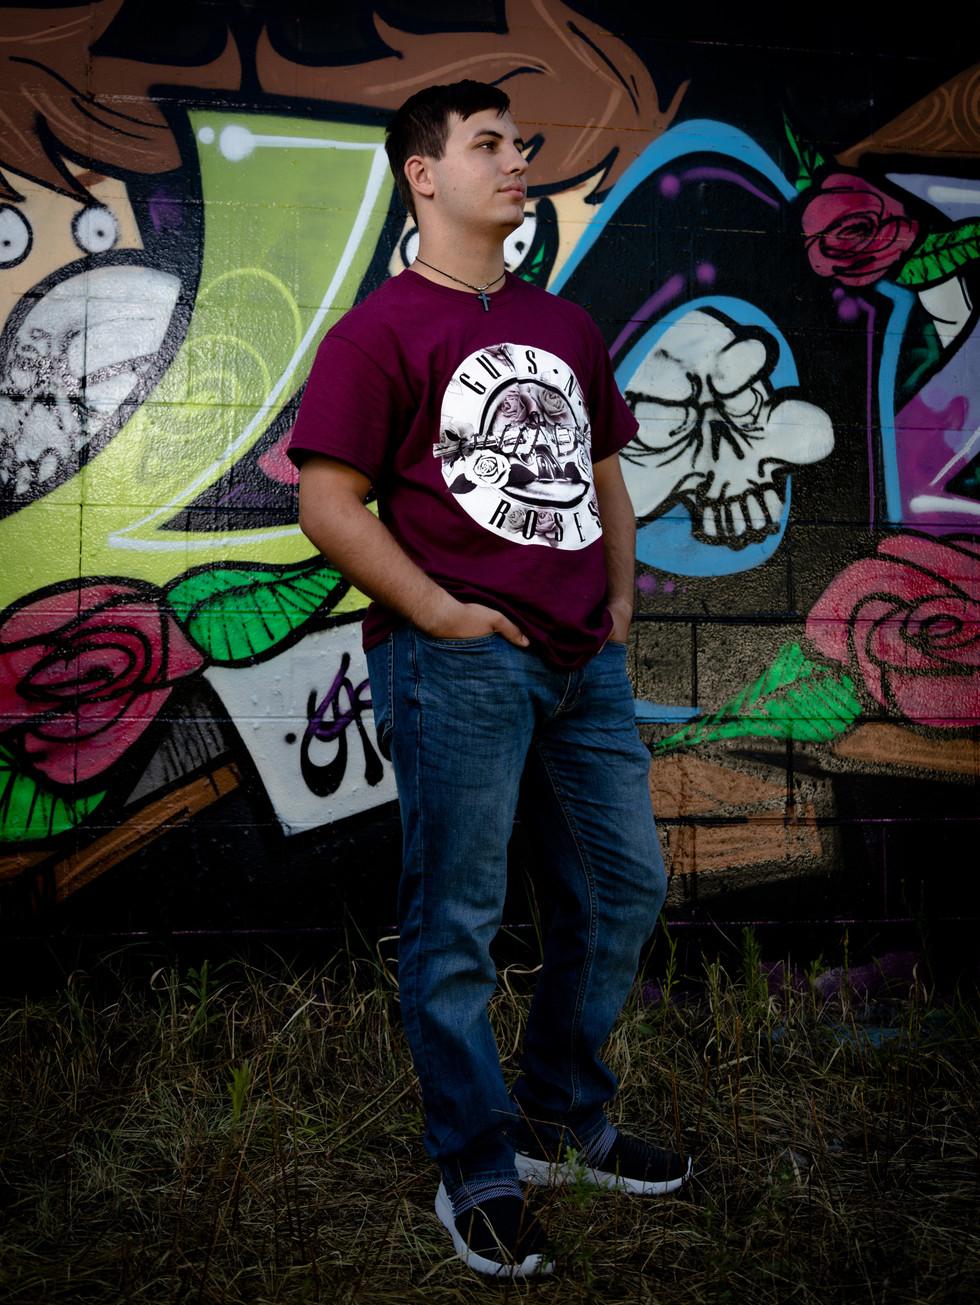 Senior Portraits at the Graffiti wall in Dayton, OH